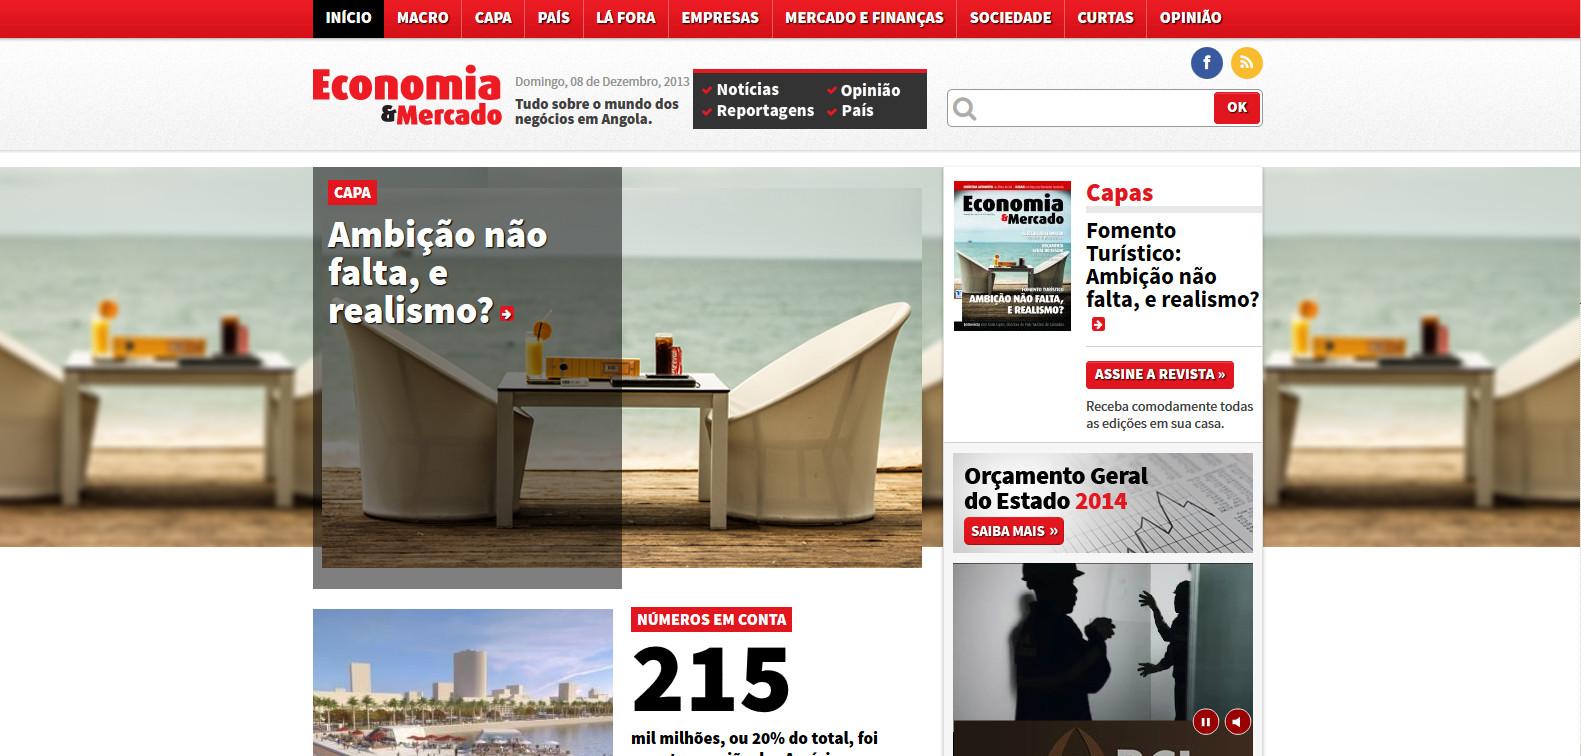 Revista Economia & Mercado